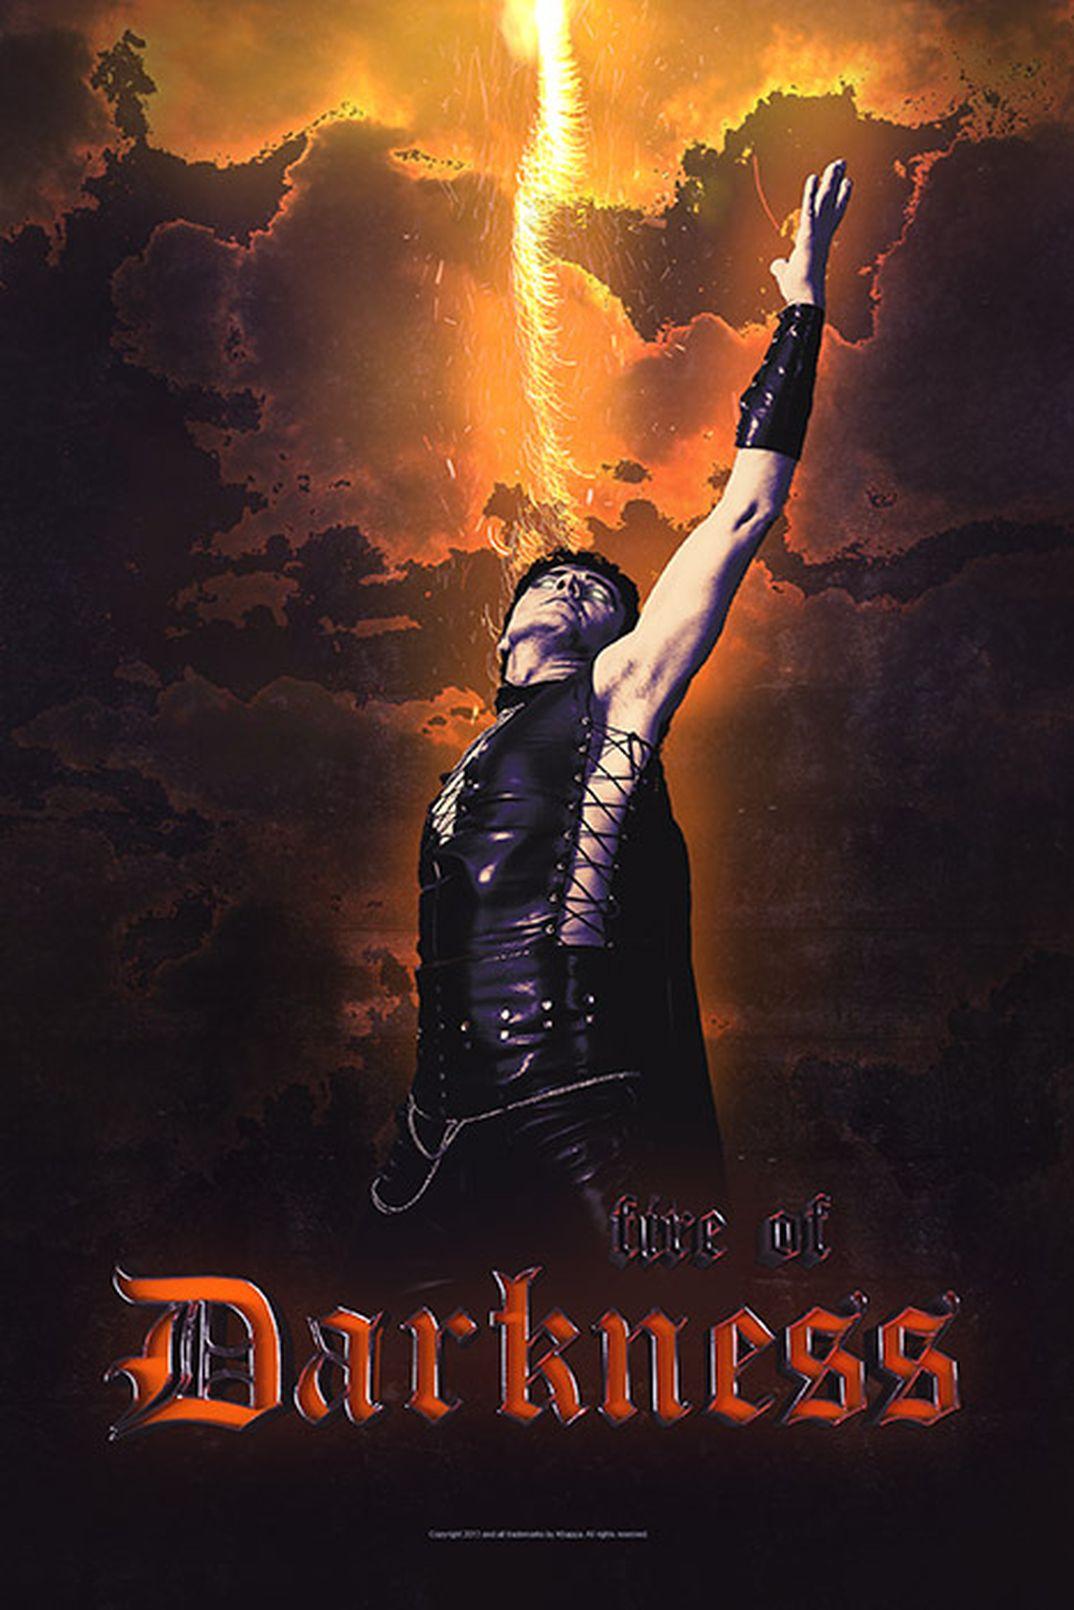 Fire of Darkness fantasy/drama movie